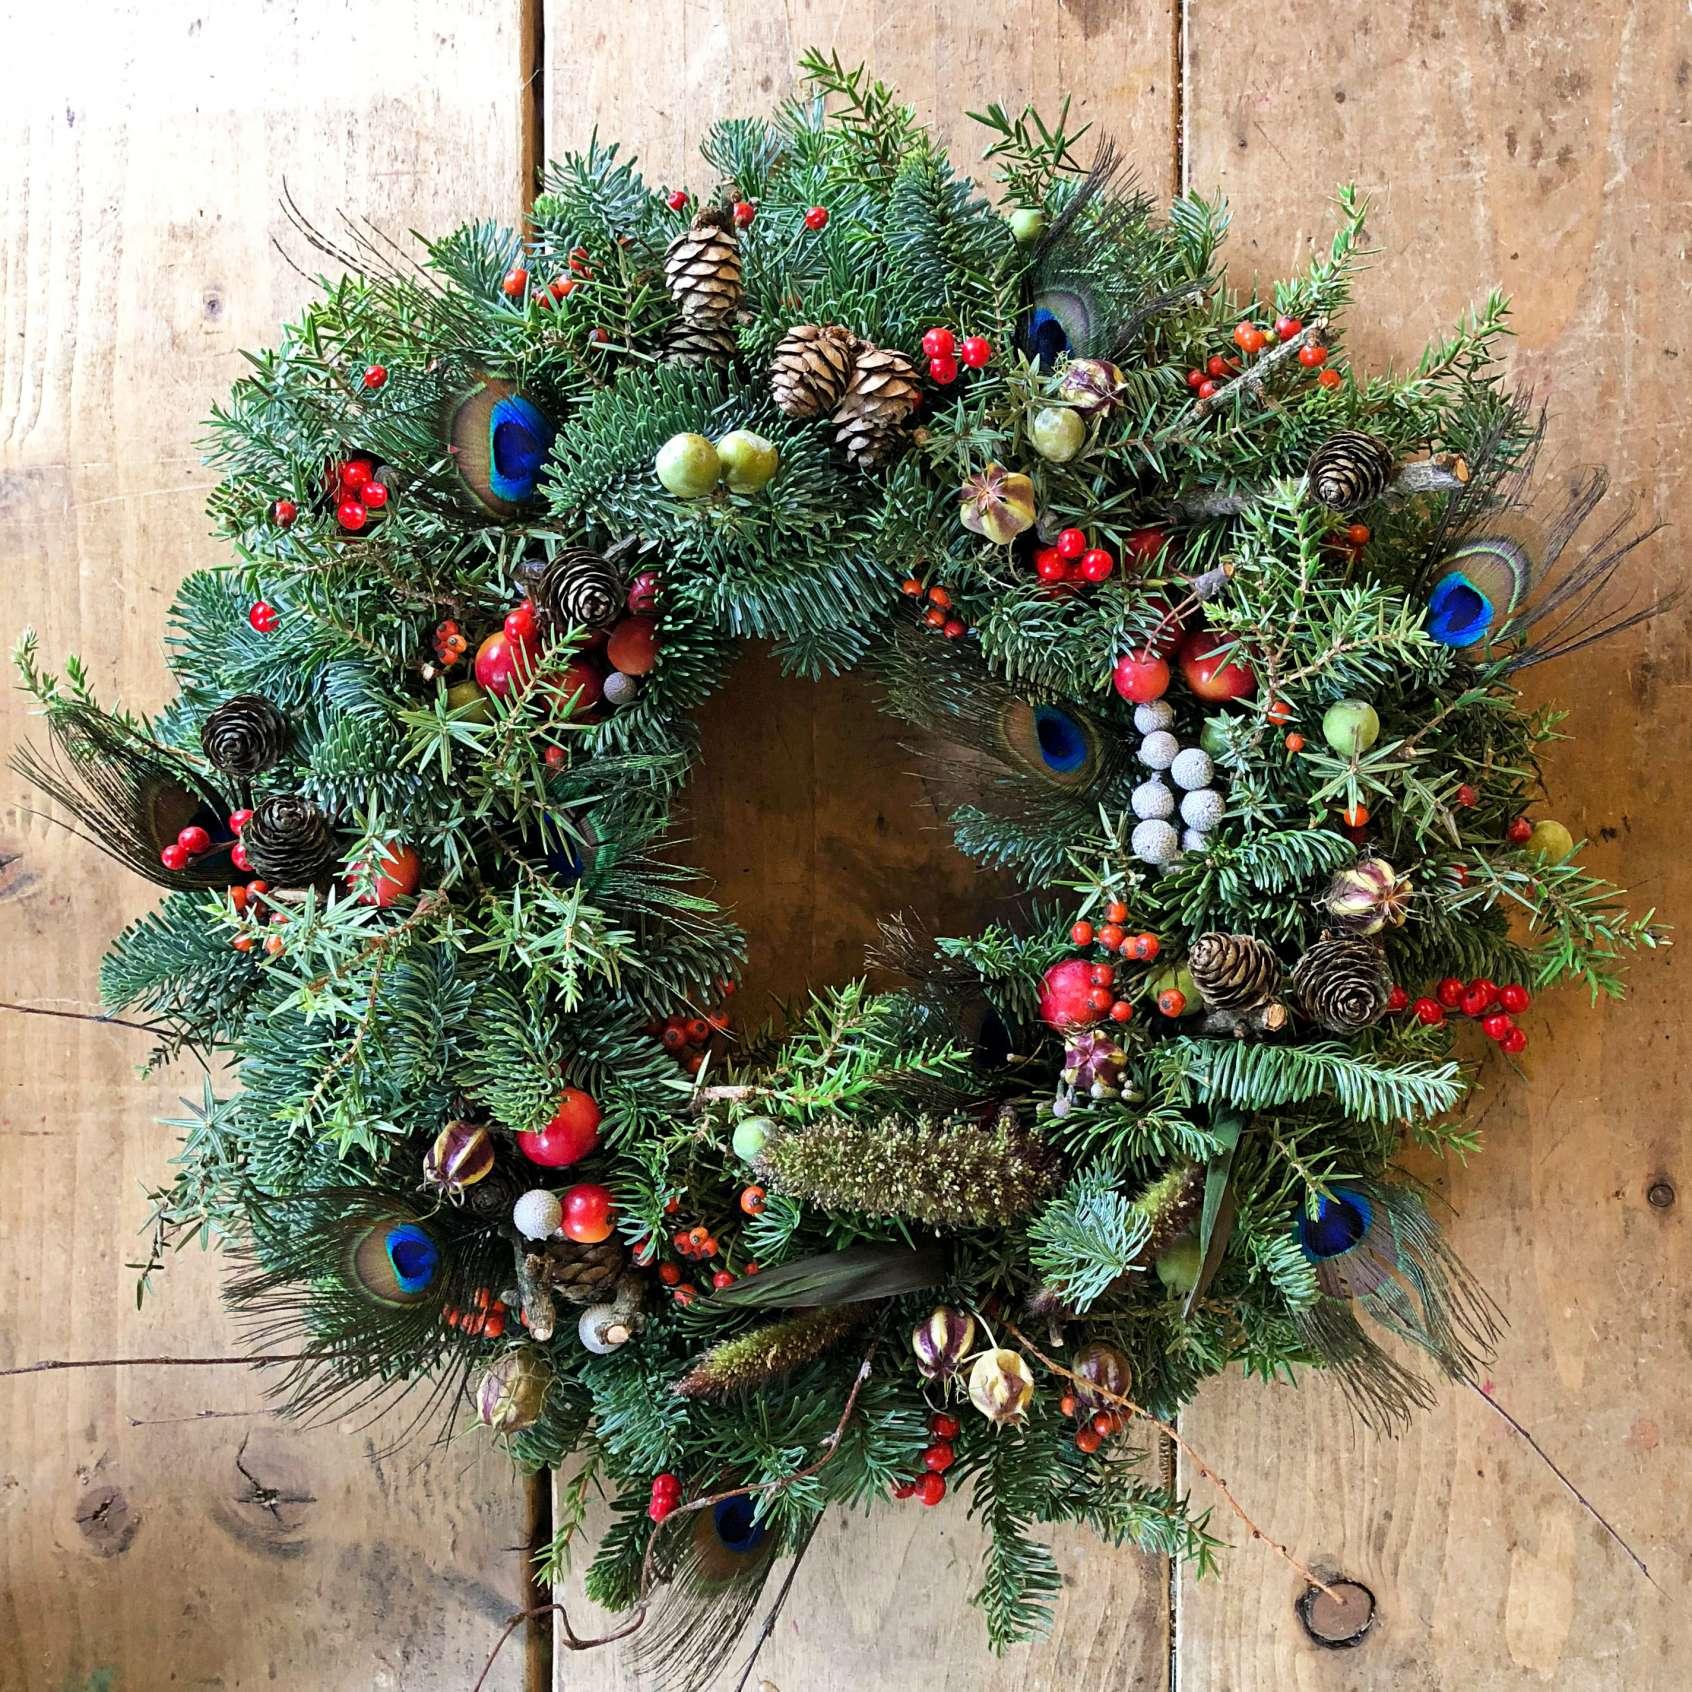 Berry Feathery Christmas Wreath 2018